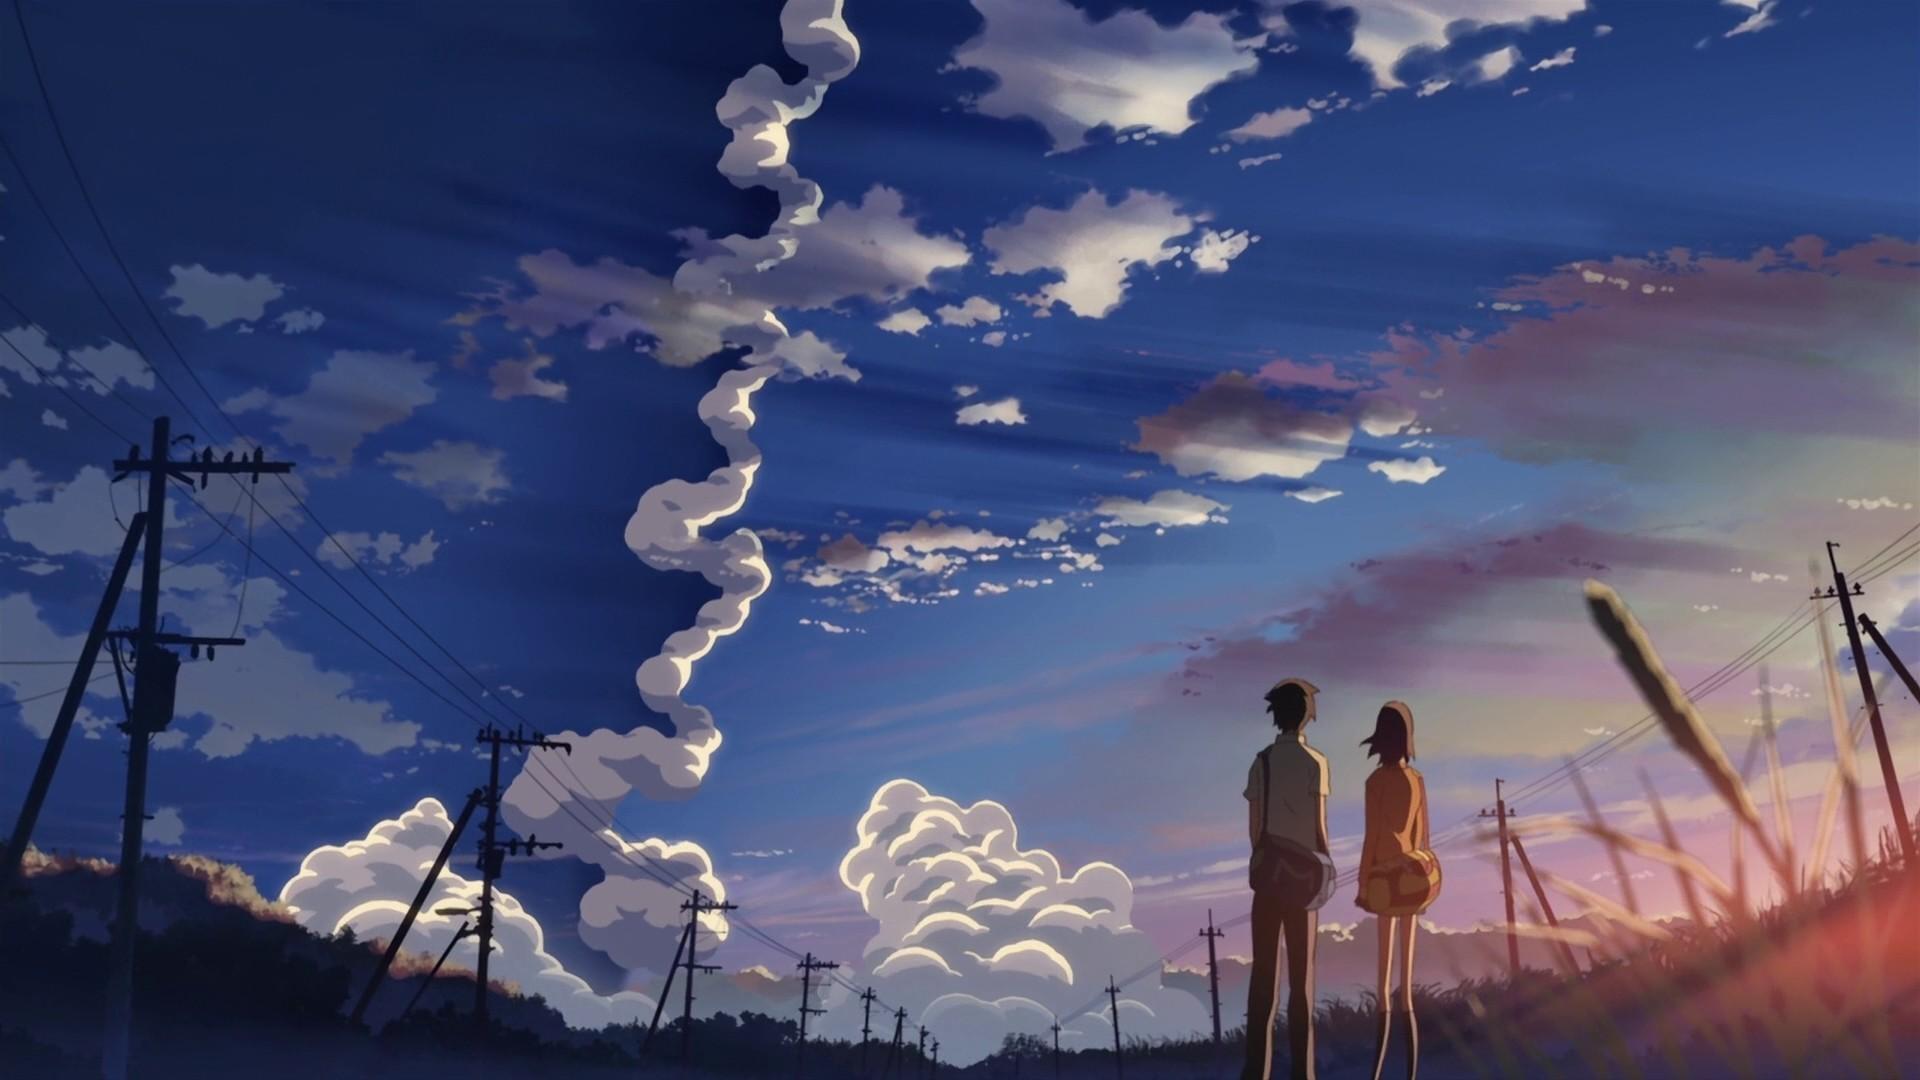 Anime Cloud HD Wallpaper